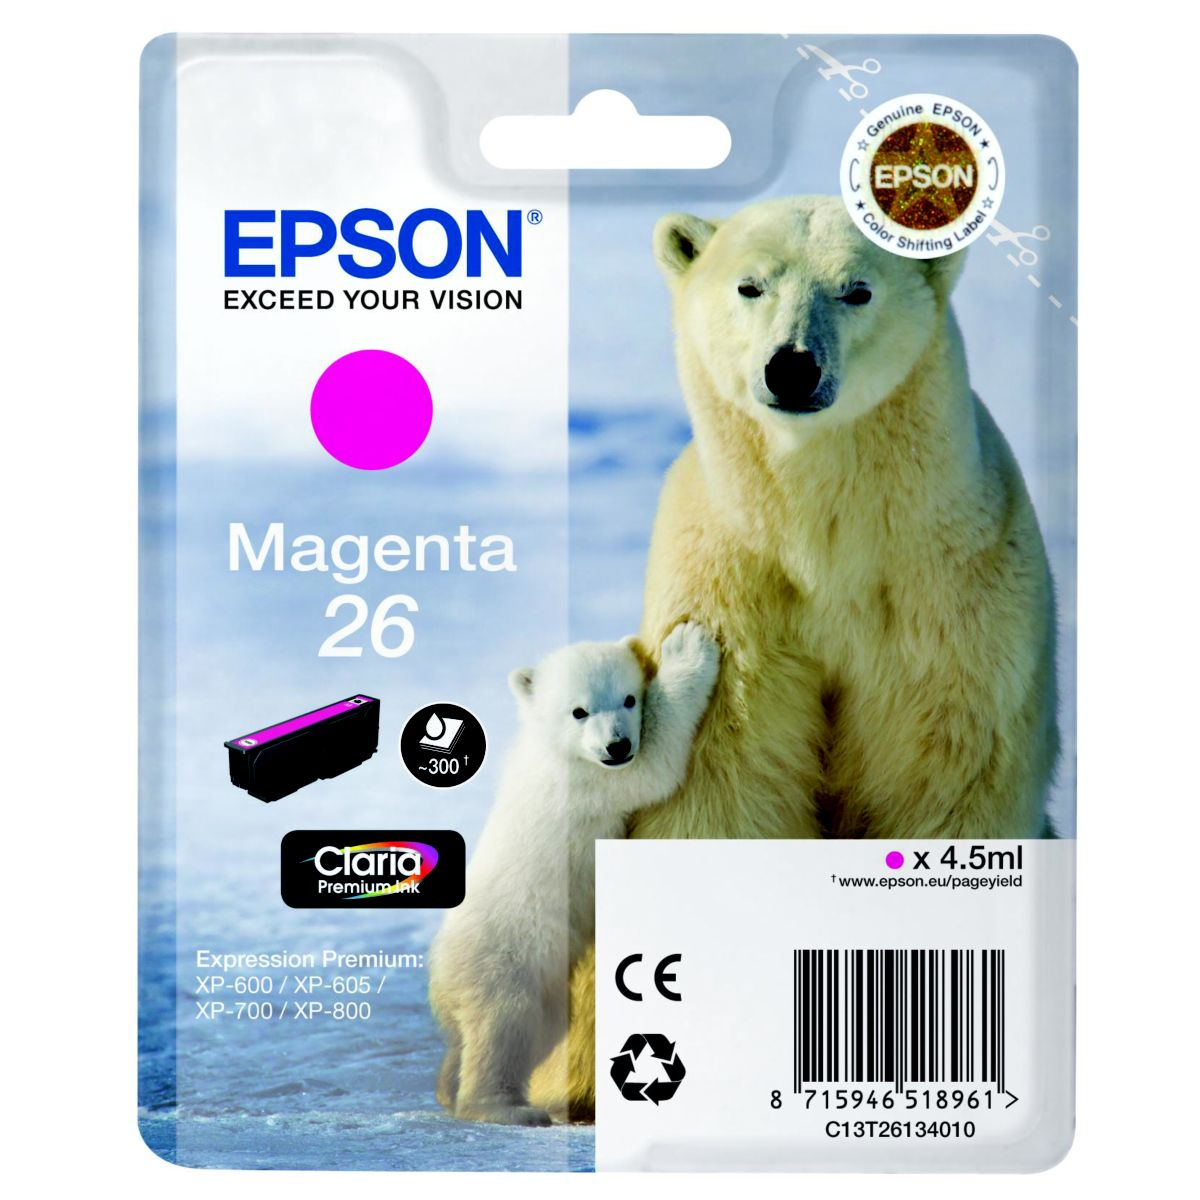 Cartouche d'encre epson t2613 magenta s�rie ours polaire